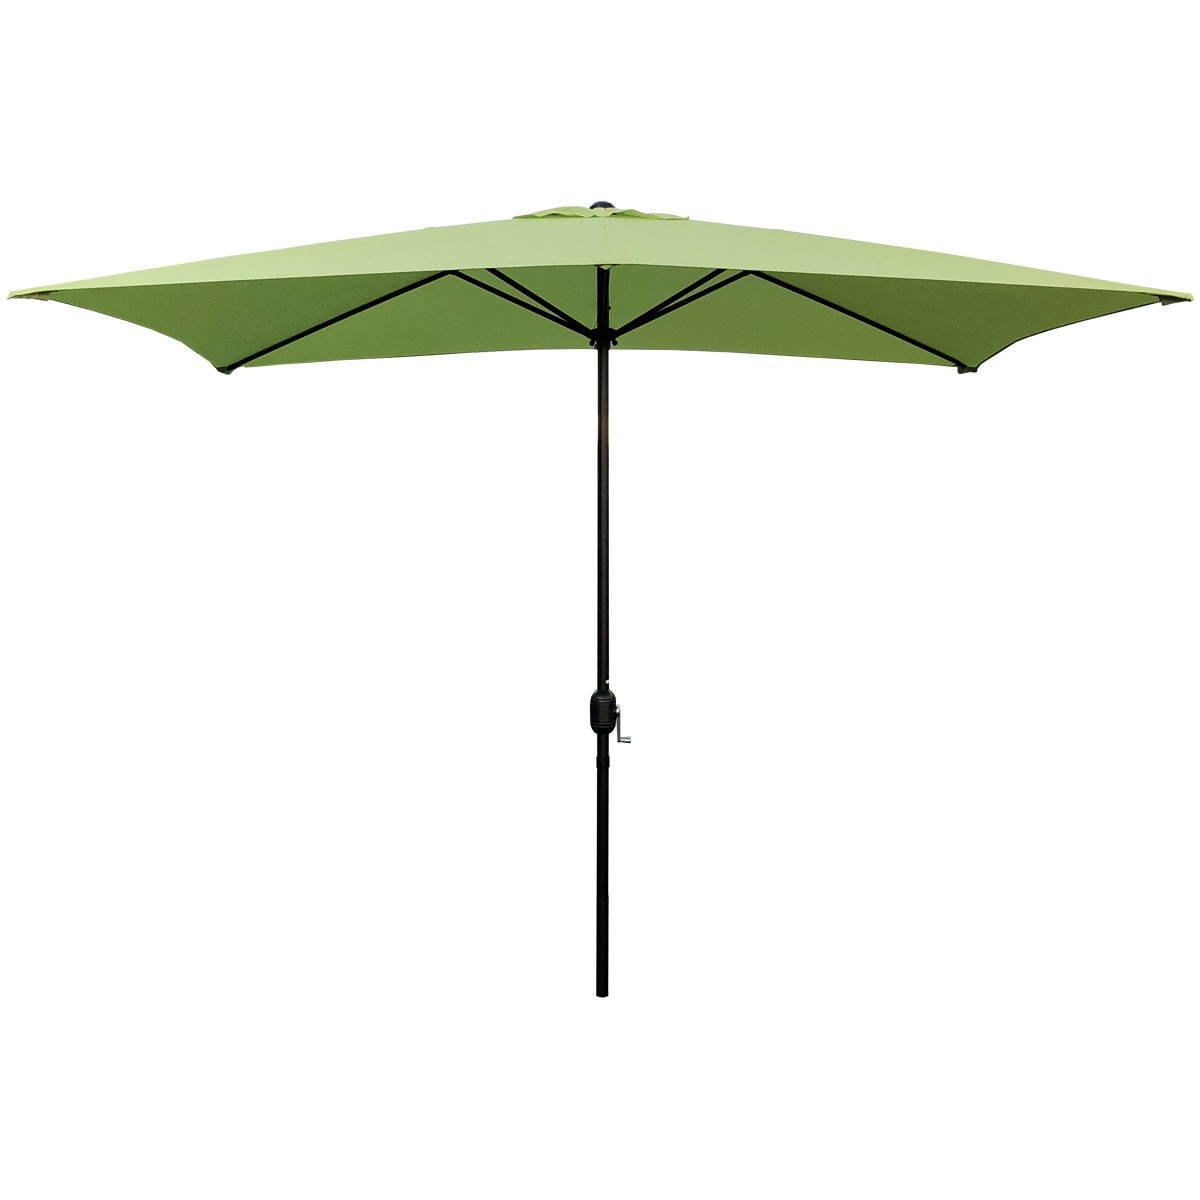 Best And Newest Hashtag Home Bradford 10' X 6.5' Rectangular Market Umbrella Regarding Bradford Patio Market Umbrellas (Gallery 4 of 20)